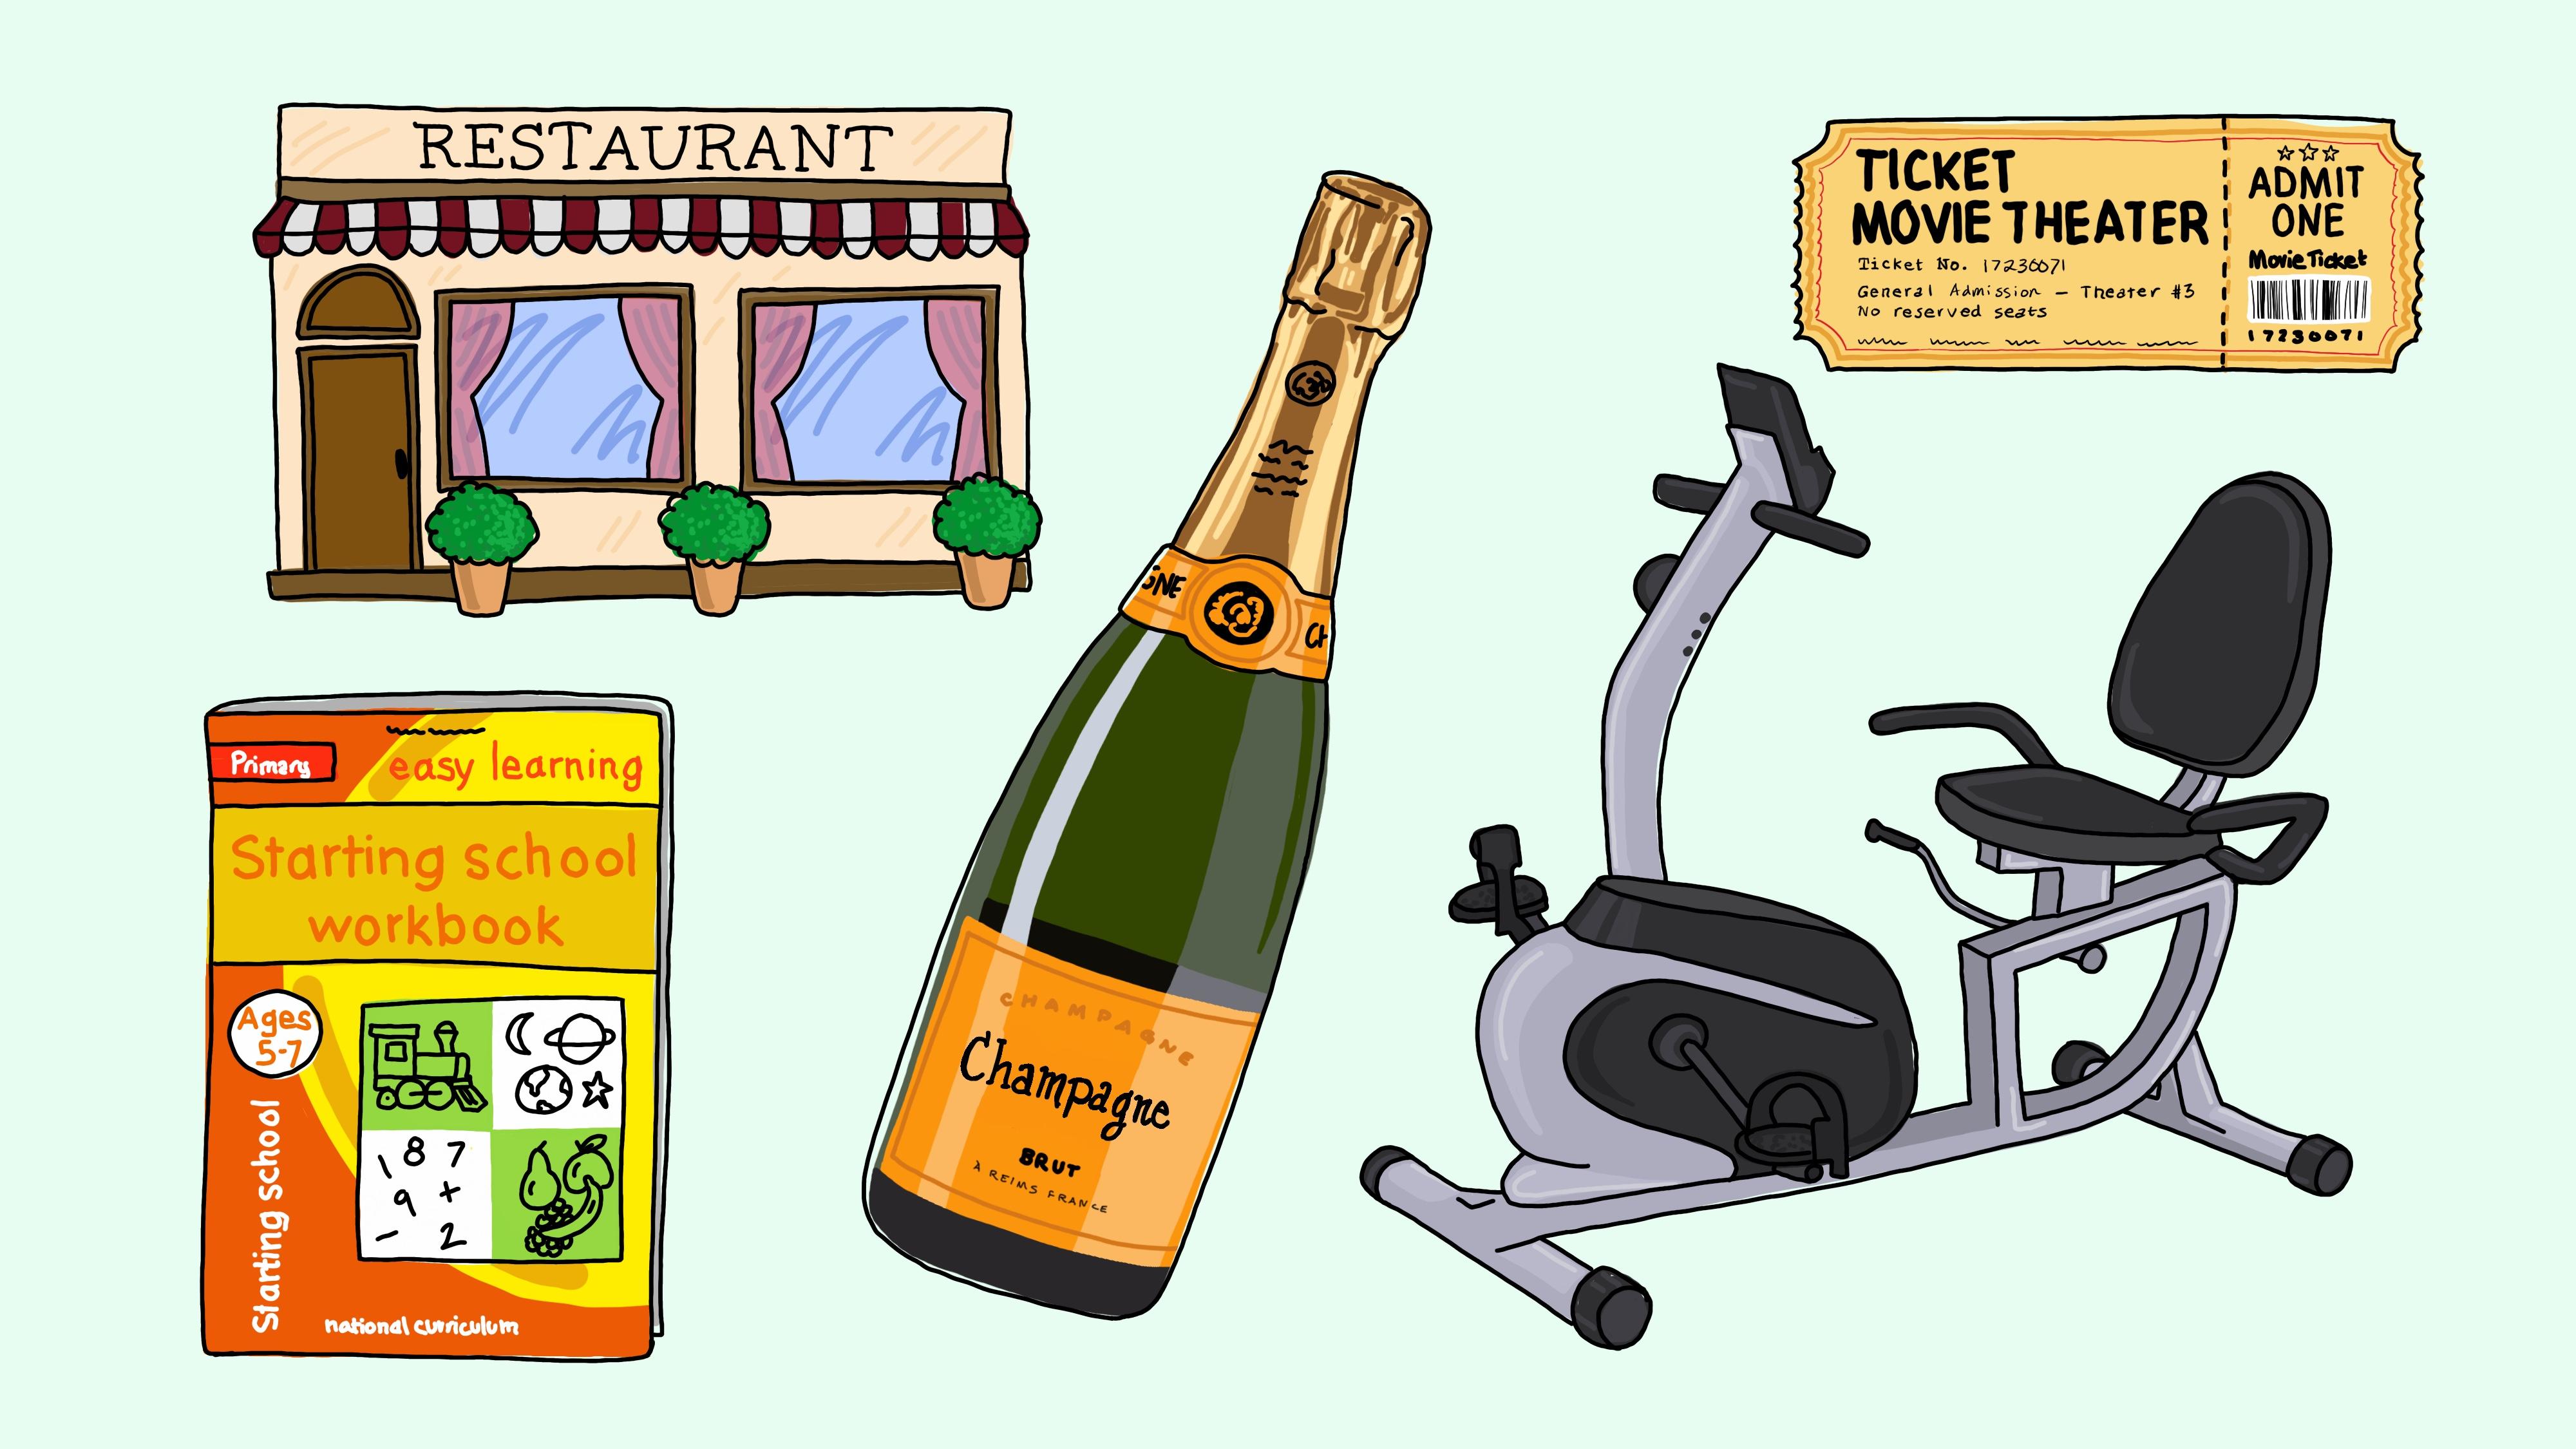 A champagne bottle, a stationary bike, a restaurant, a ticket, a workbook